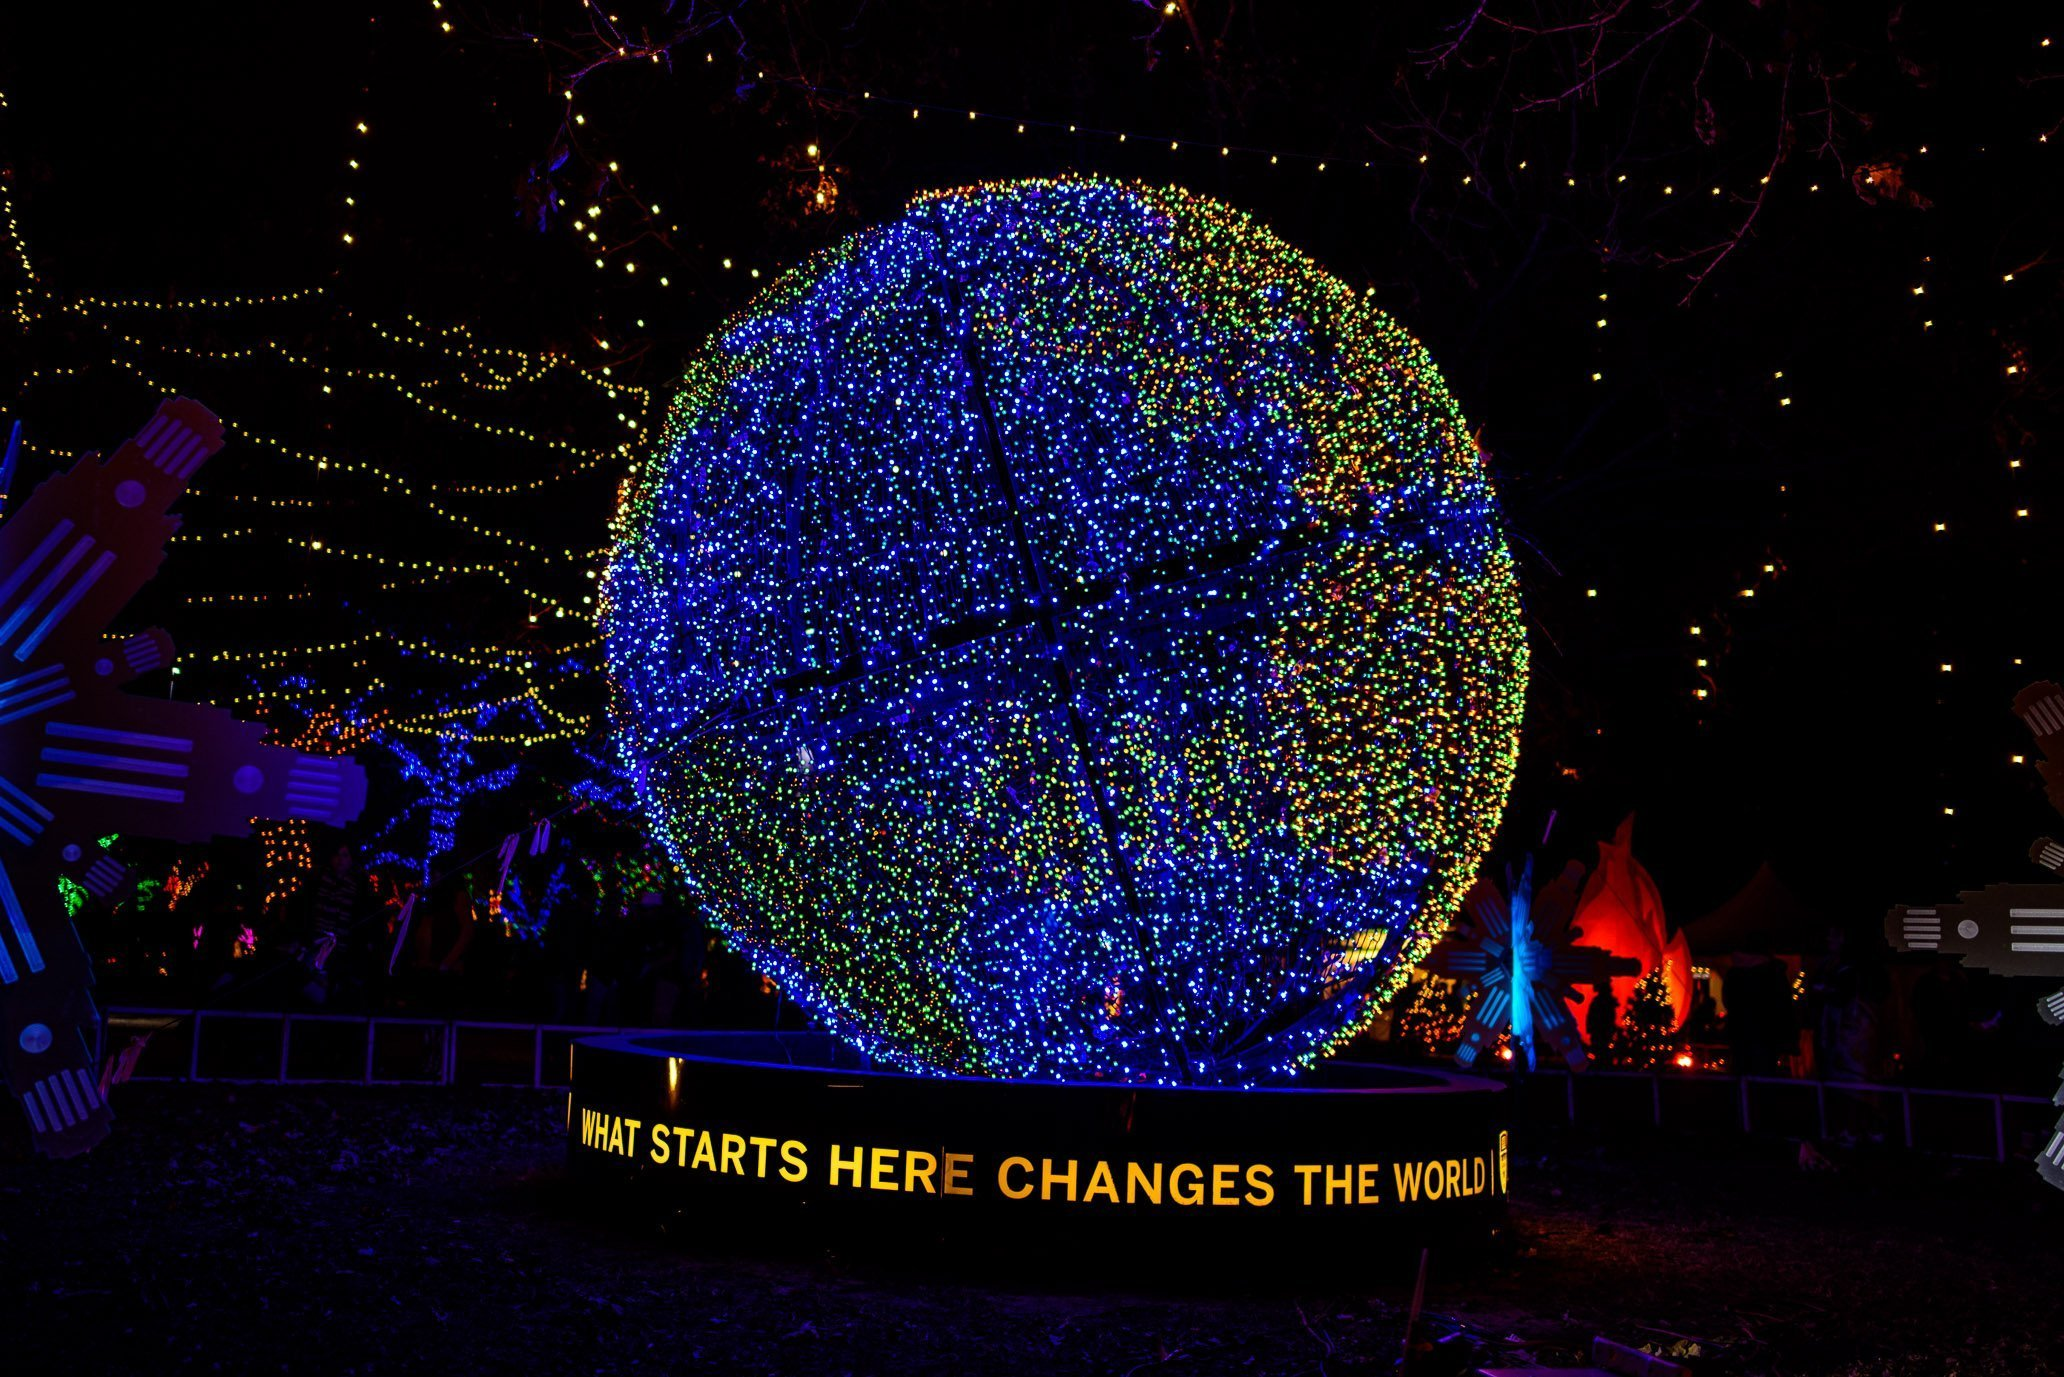 Trail of Lights, world